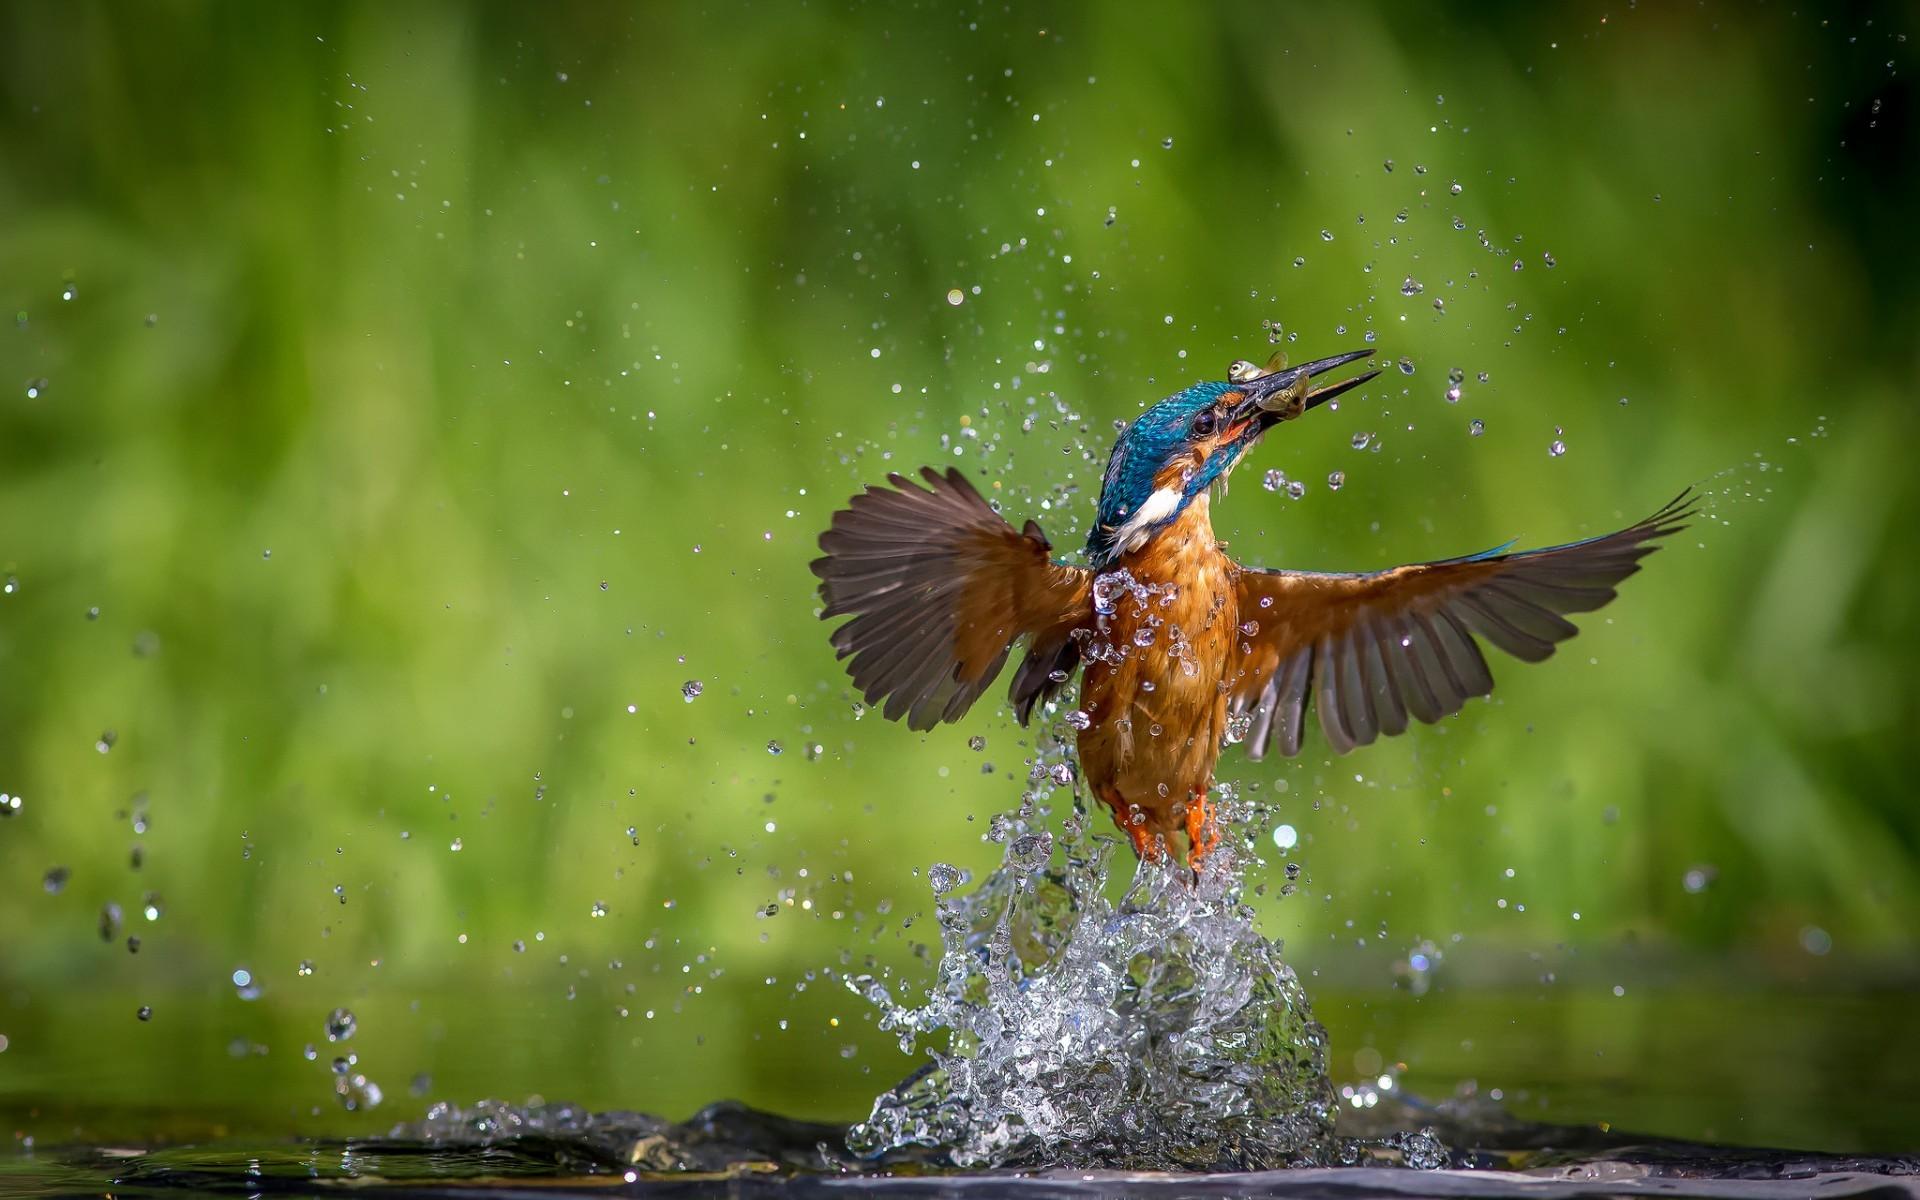 Kingfisher bird 1